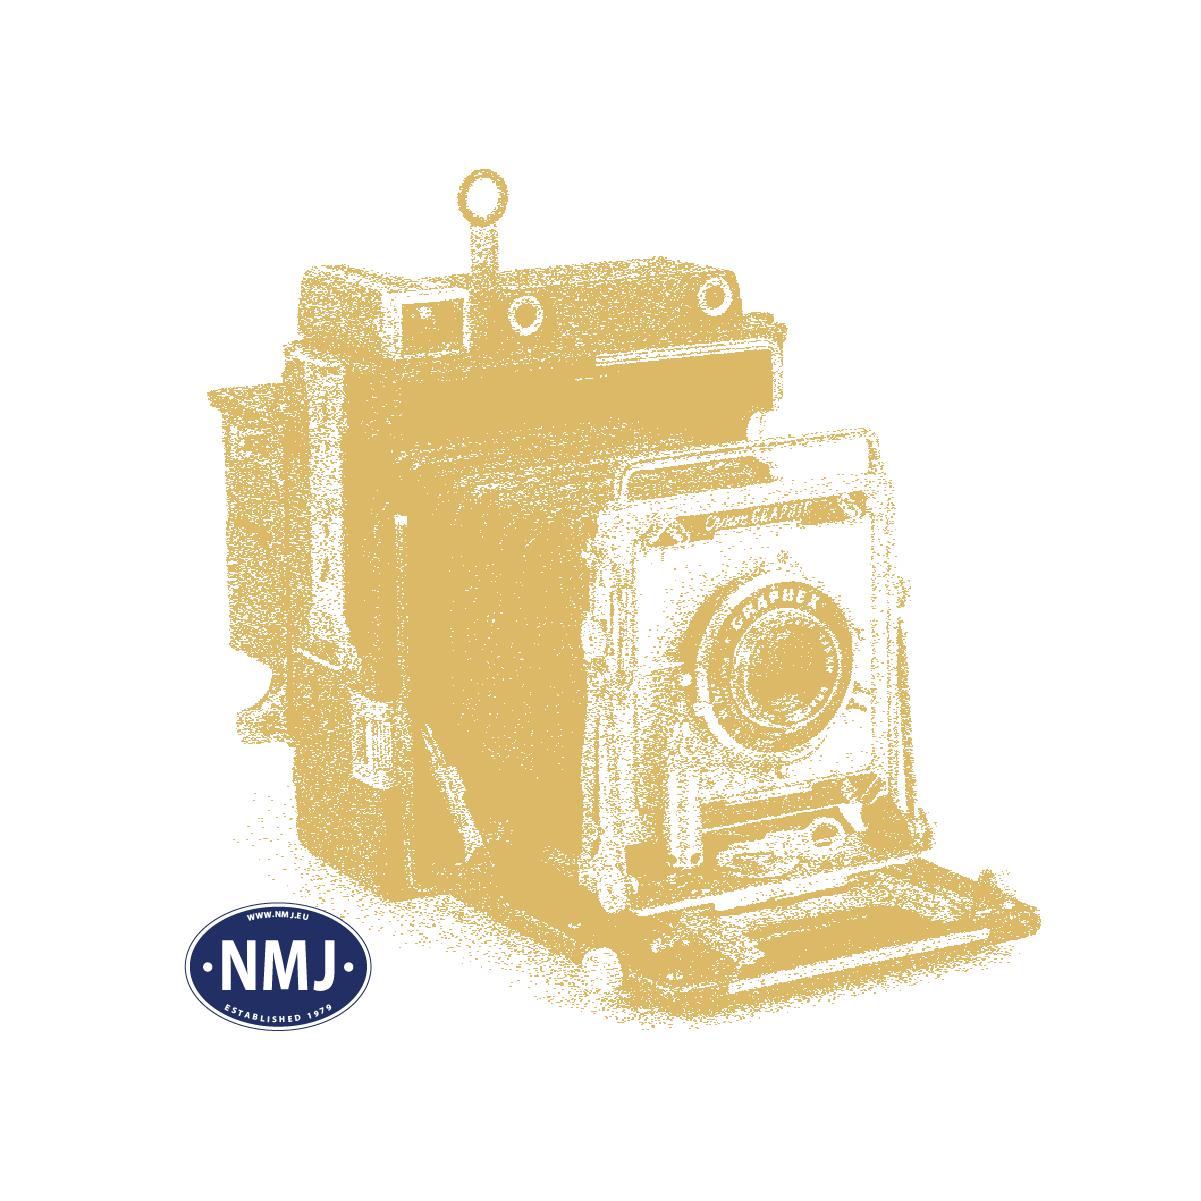 WODFS615 - Lysegrønt Statisk Gress, 2mm, 70g